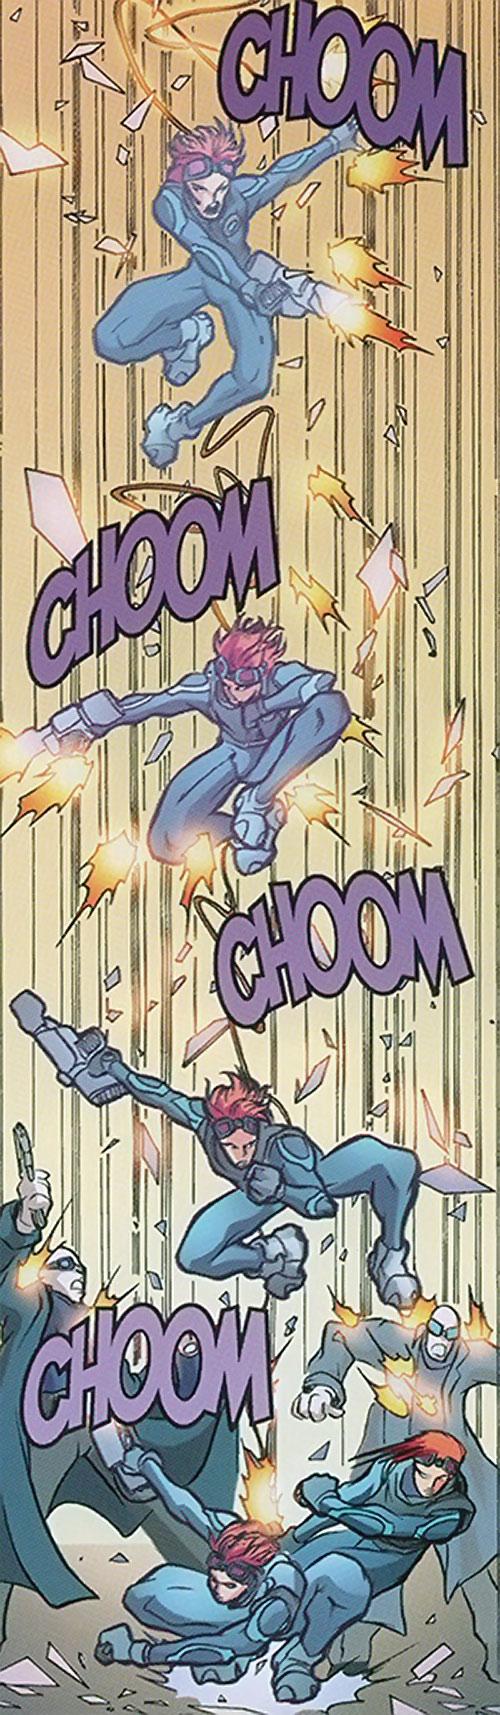 Spyboy (Peter David comics) shooting while dropping down